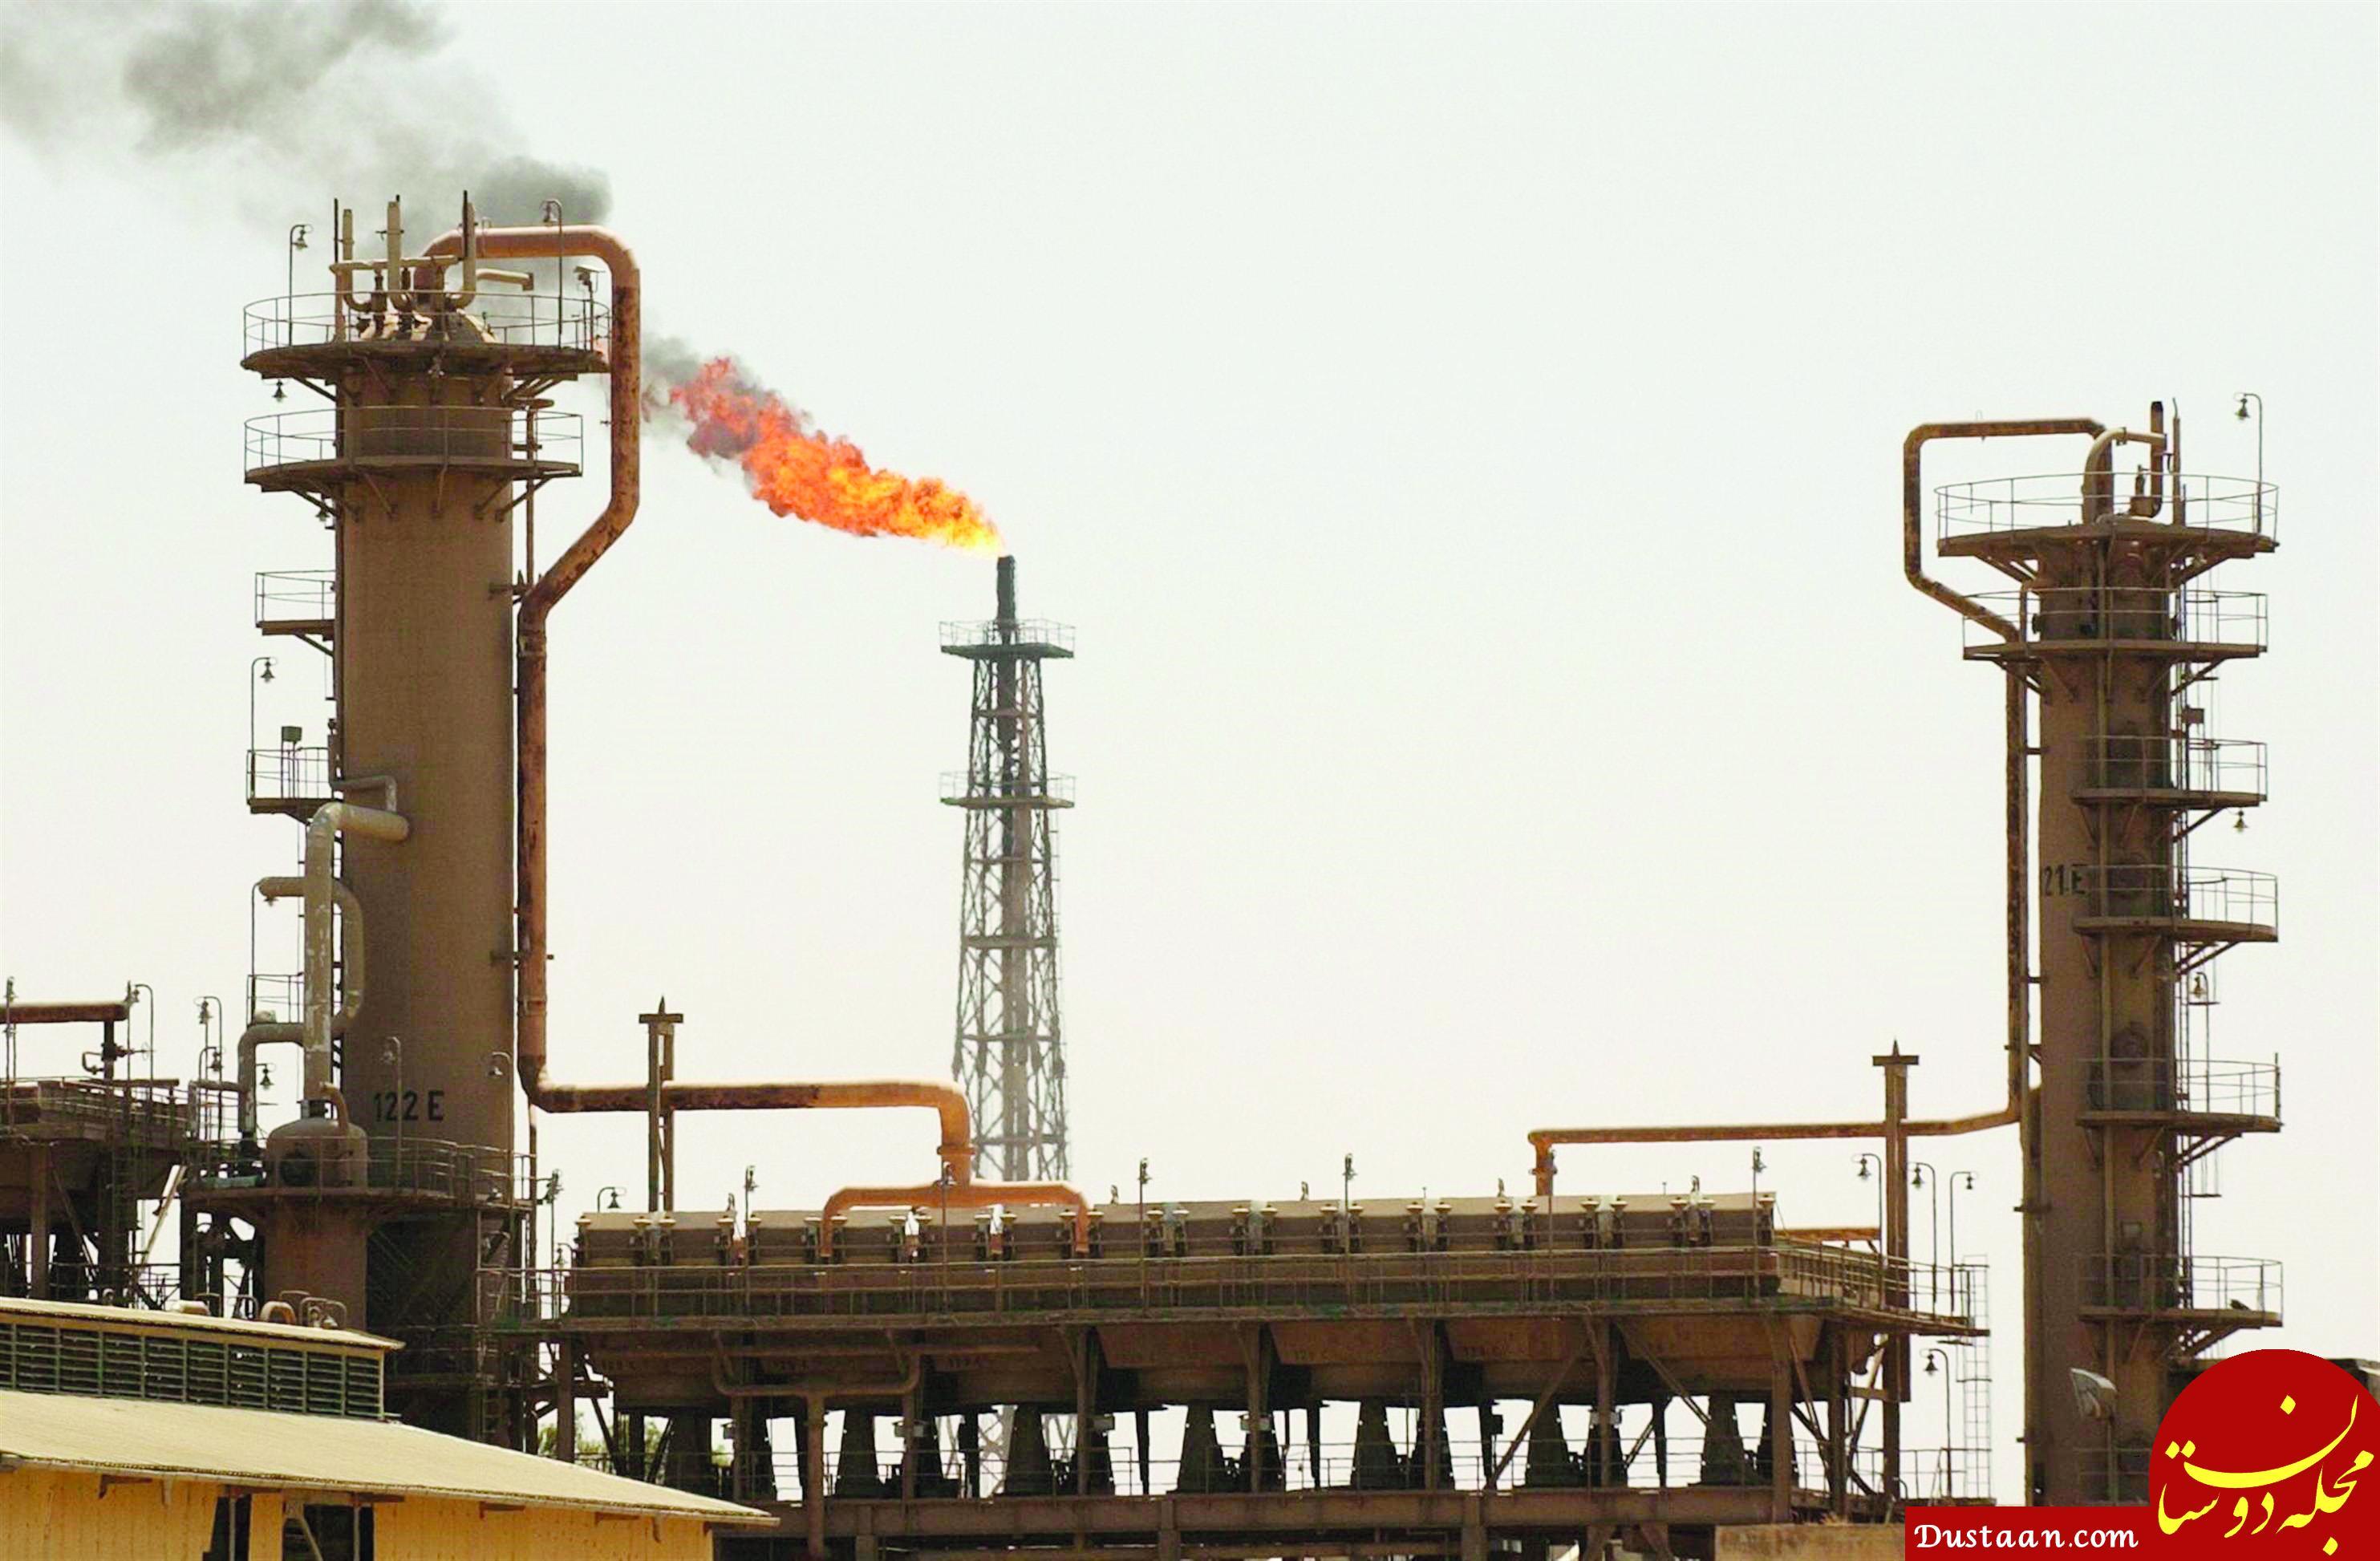 www.dustaan.com تمدید ۵ ساله قرارداد نفتی ایران و روسیه